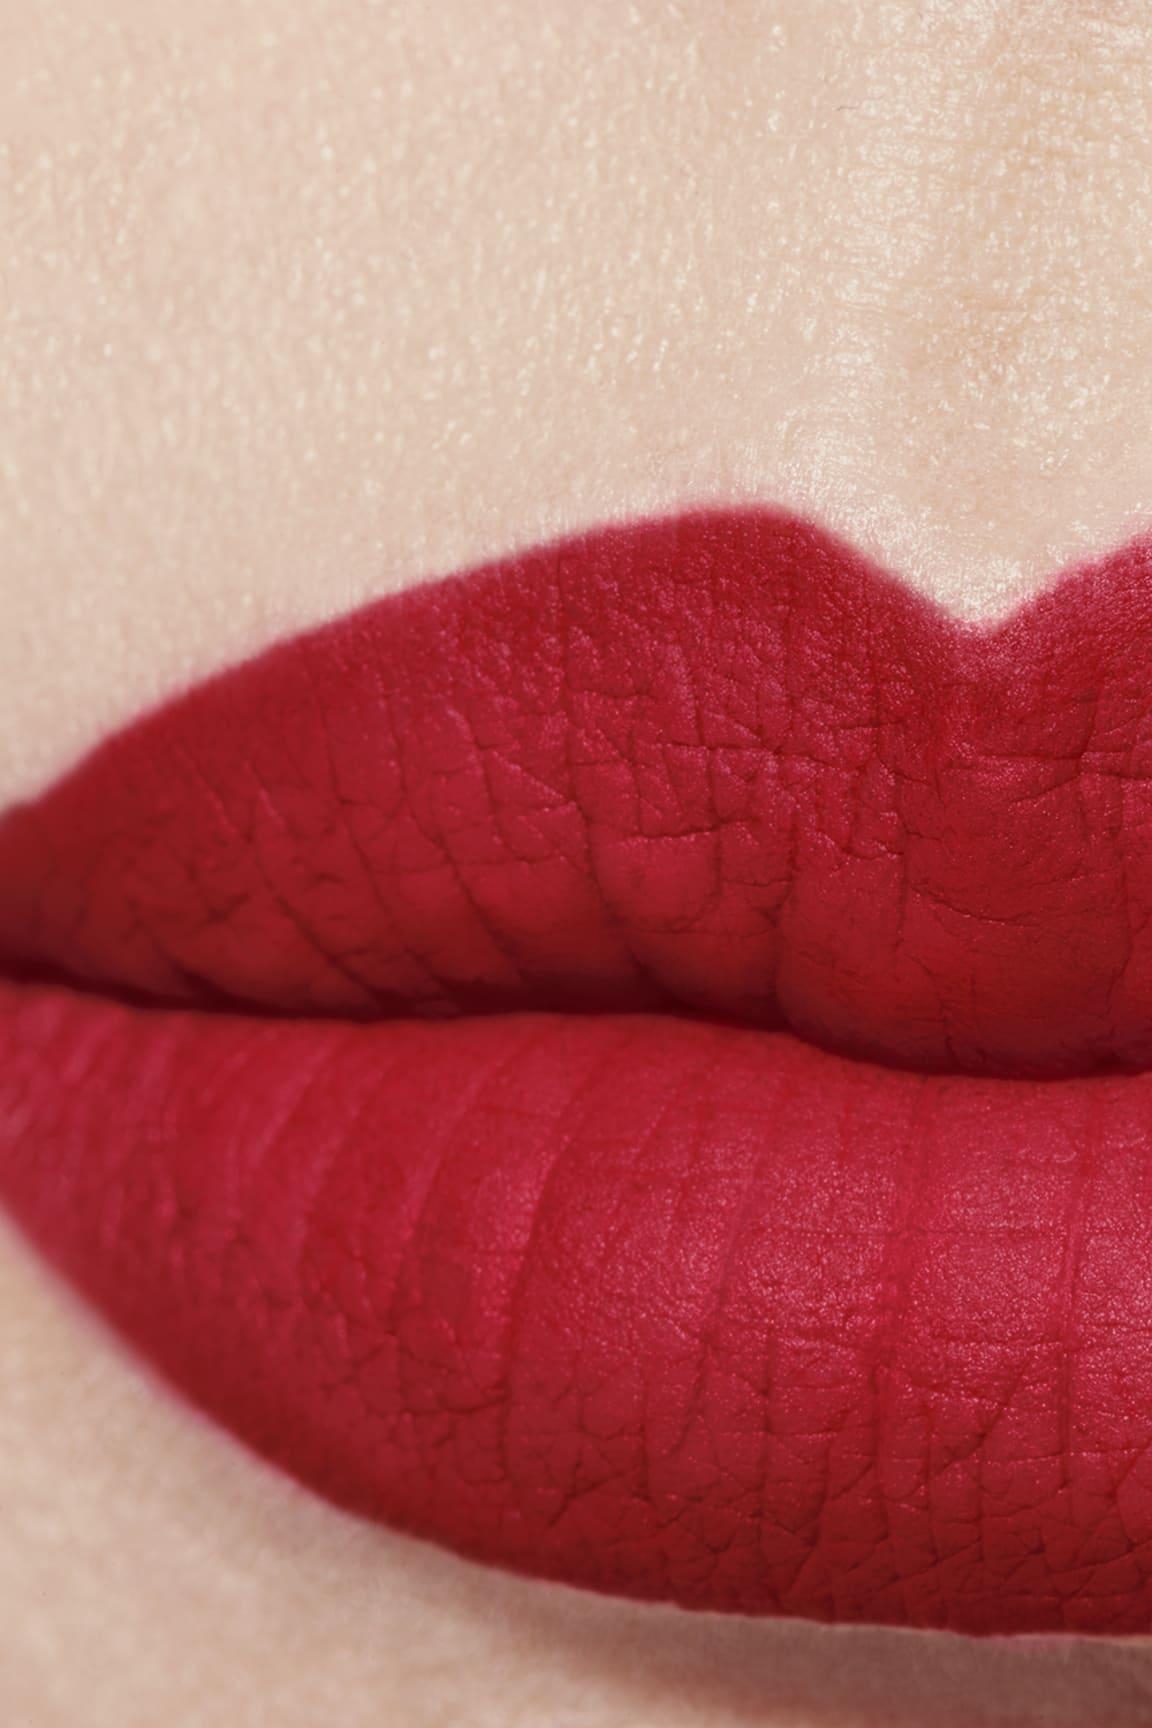 Application makeup visual 1 - ROUGE ALLURE VELVET EXTRÊME 112 - IDÉAL